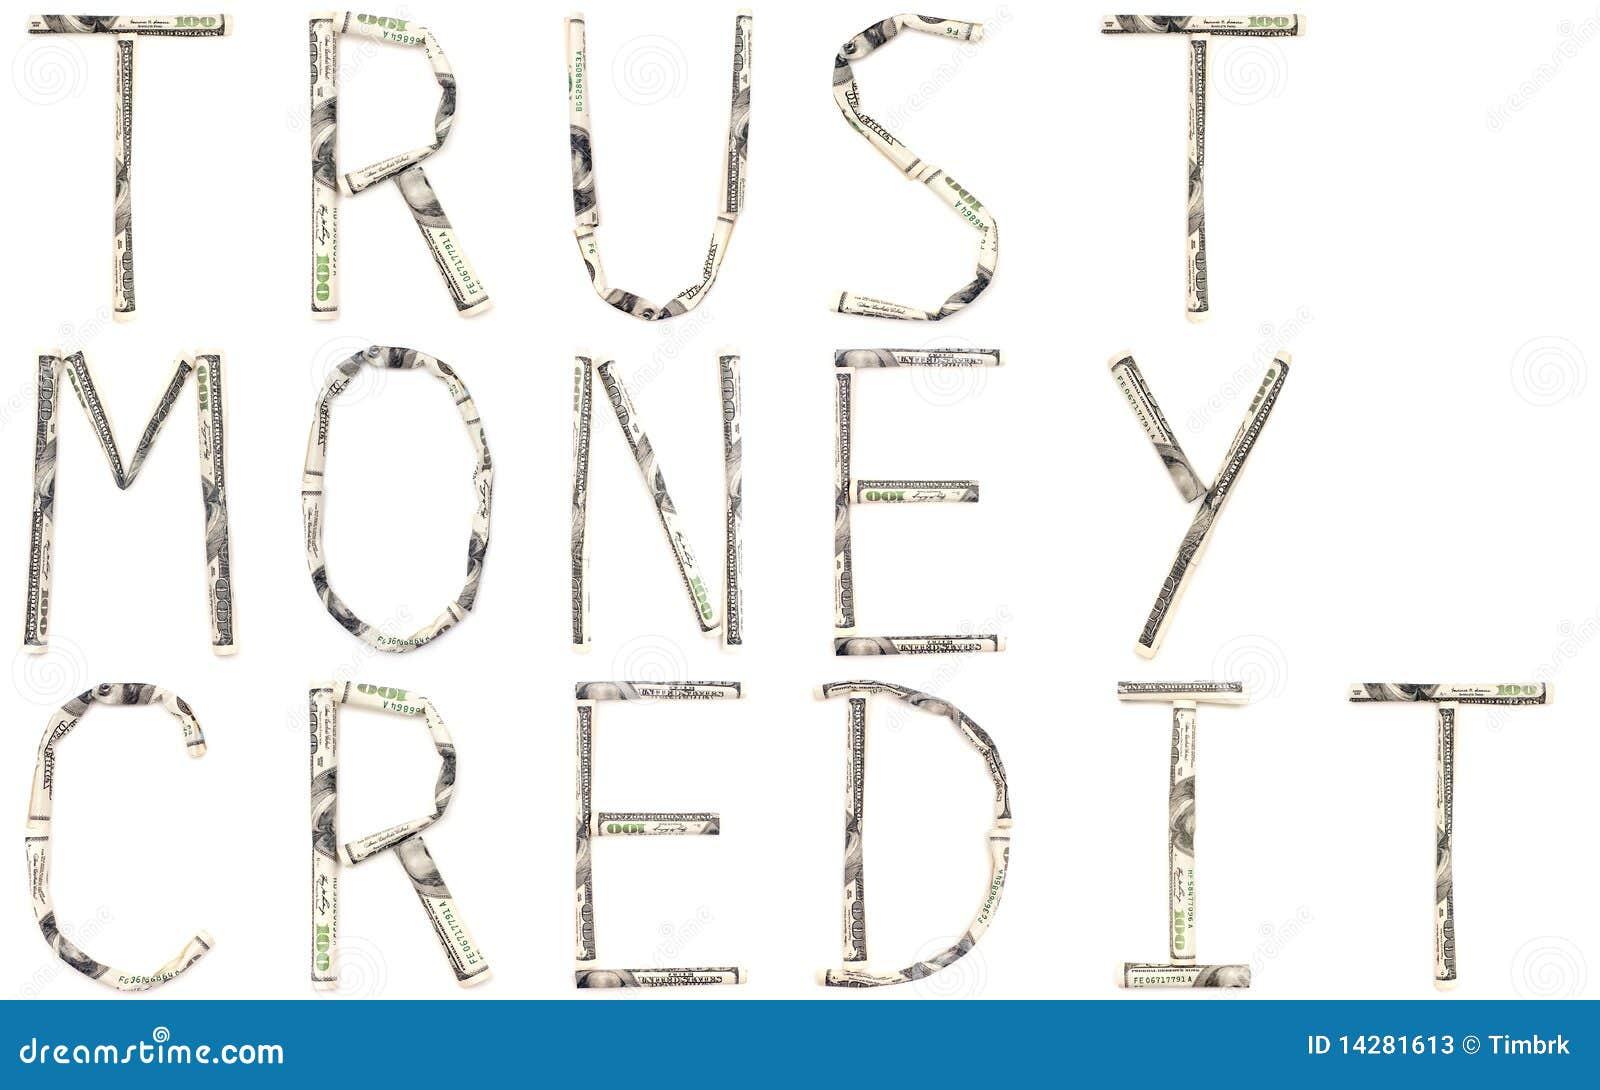 Animation trust essay writing